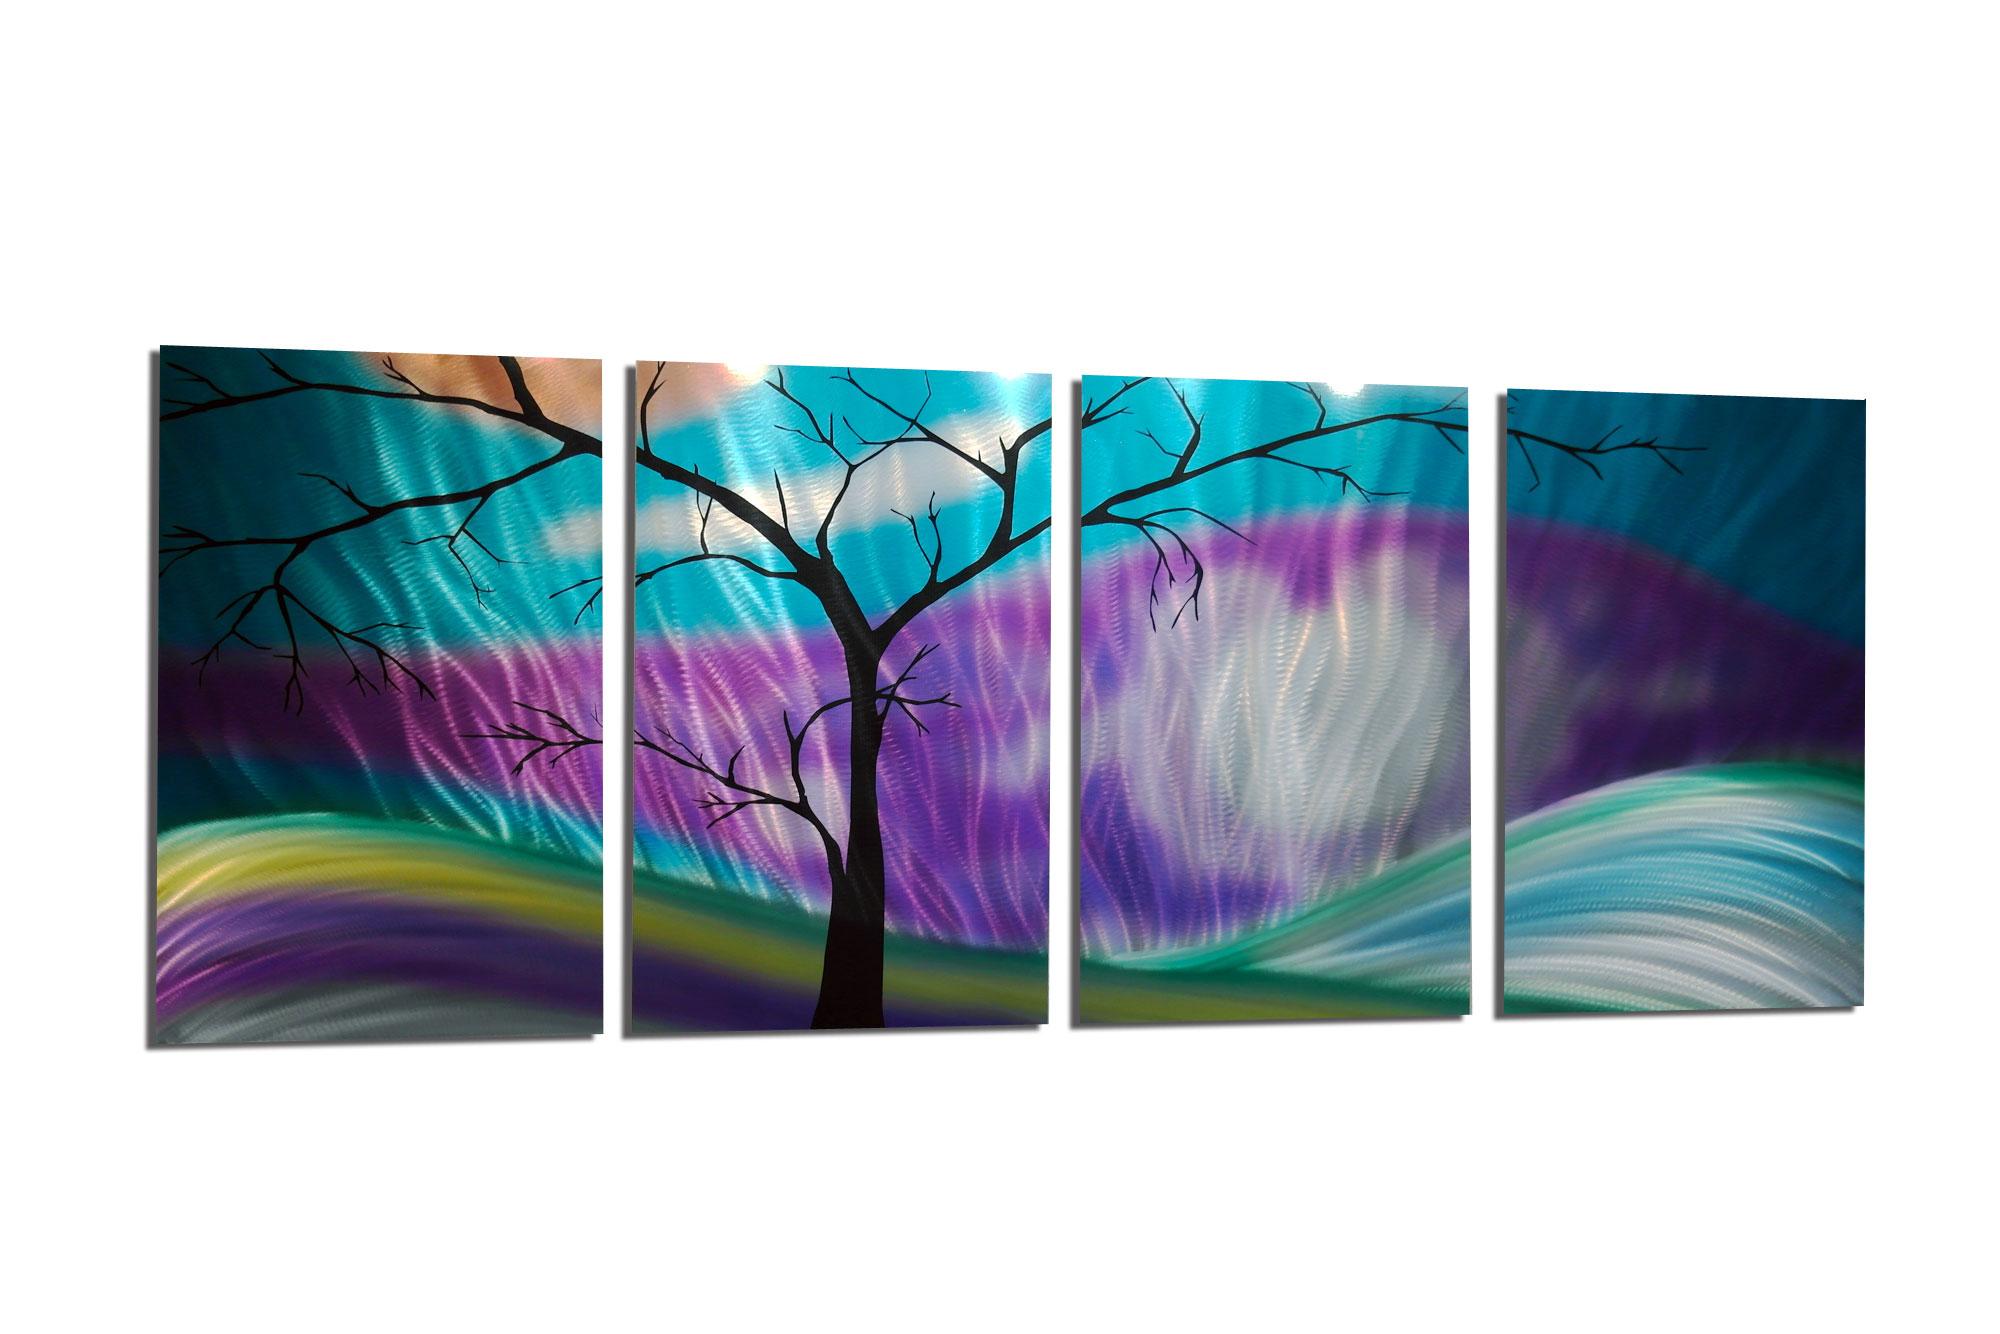 Metal Tree Wall Art Gallery: Abstract Metal Wall Art Contemporary